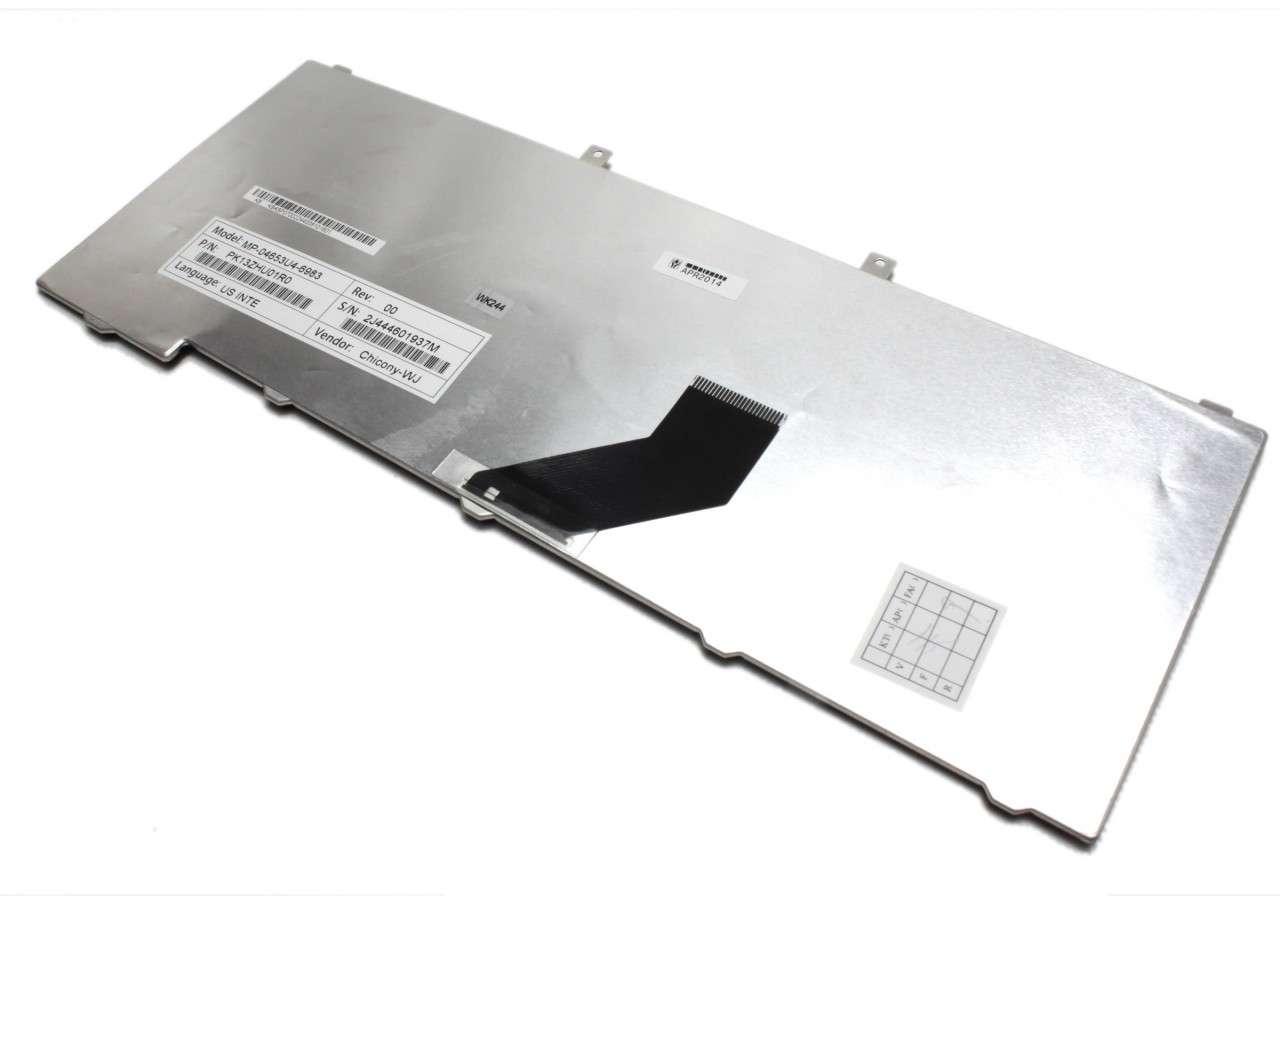 Tastatura Acer MP-04653U4-698 imagine powerlaptop.ro 2021